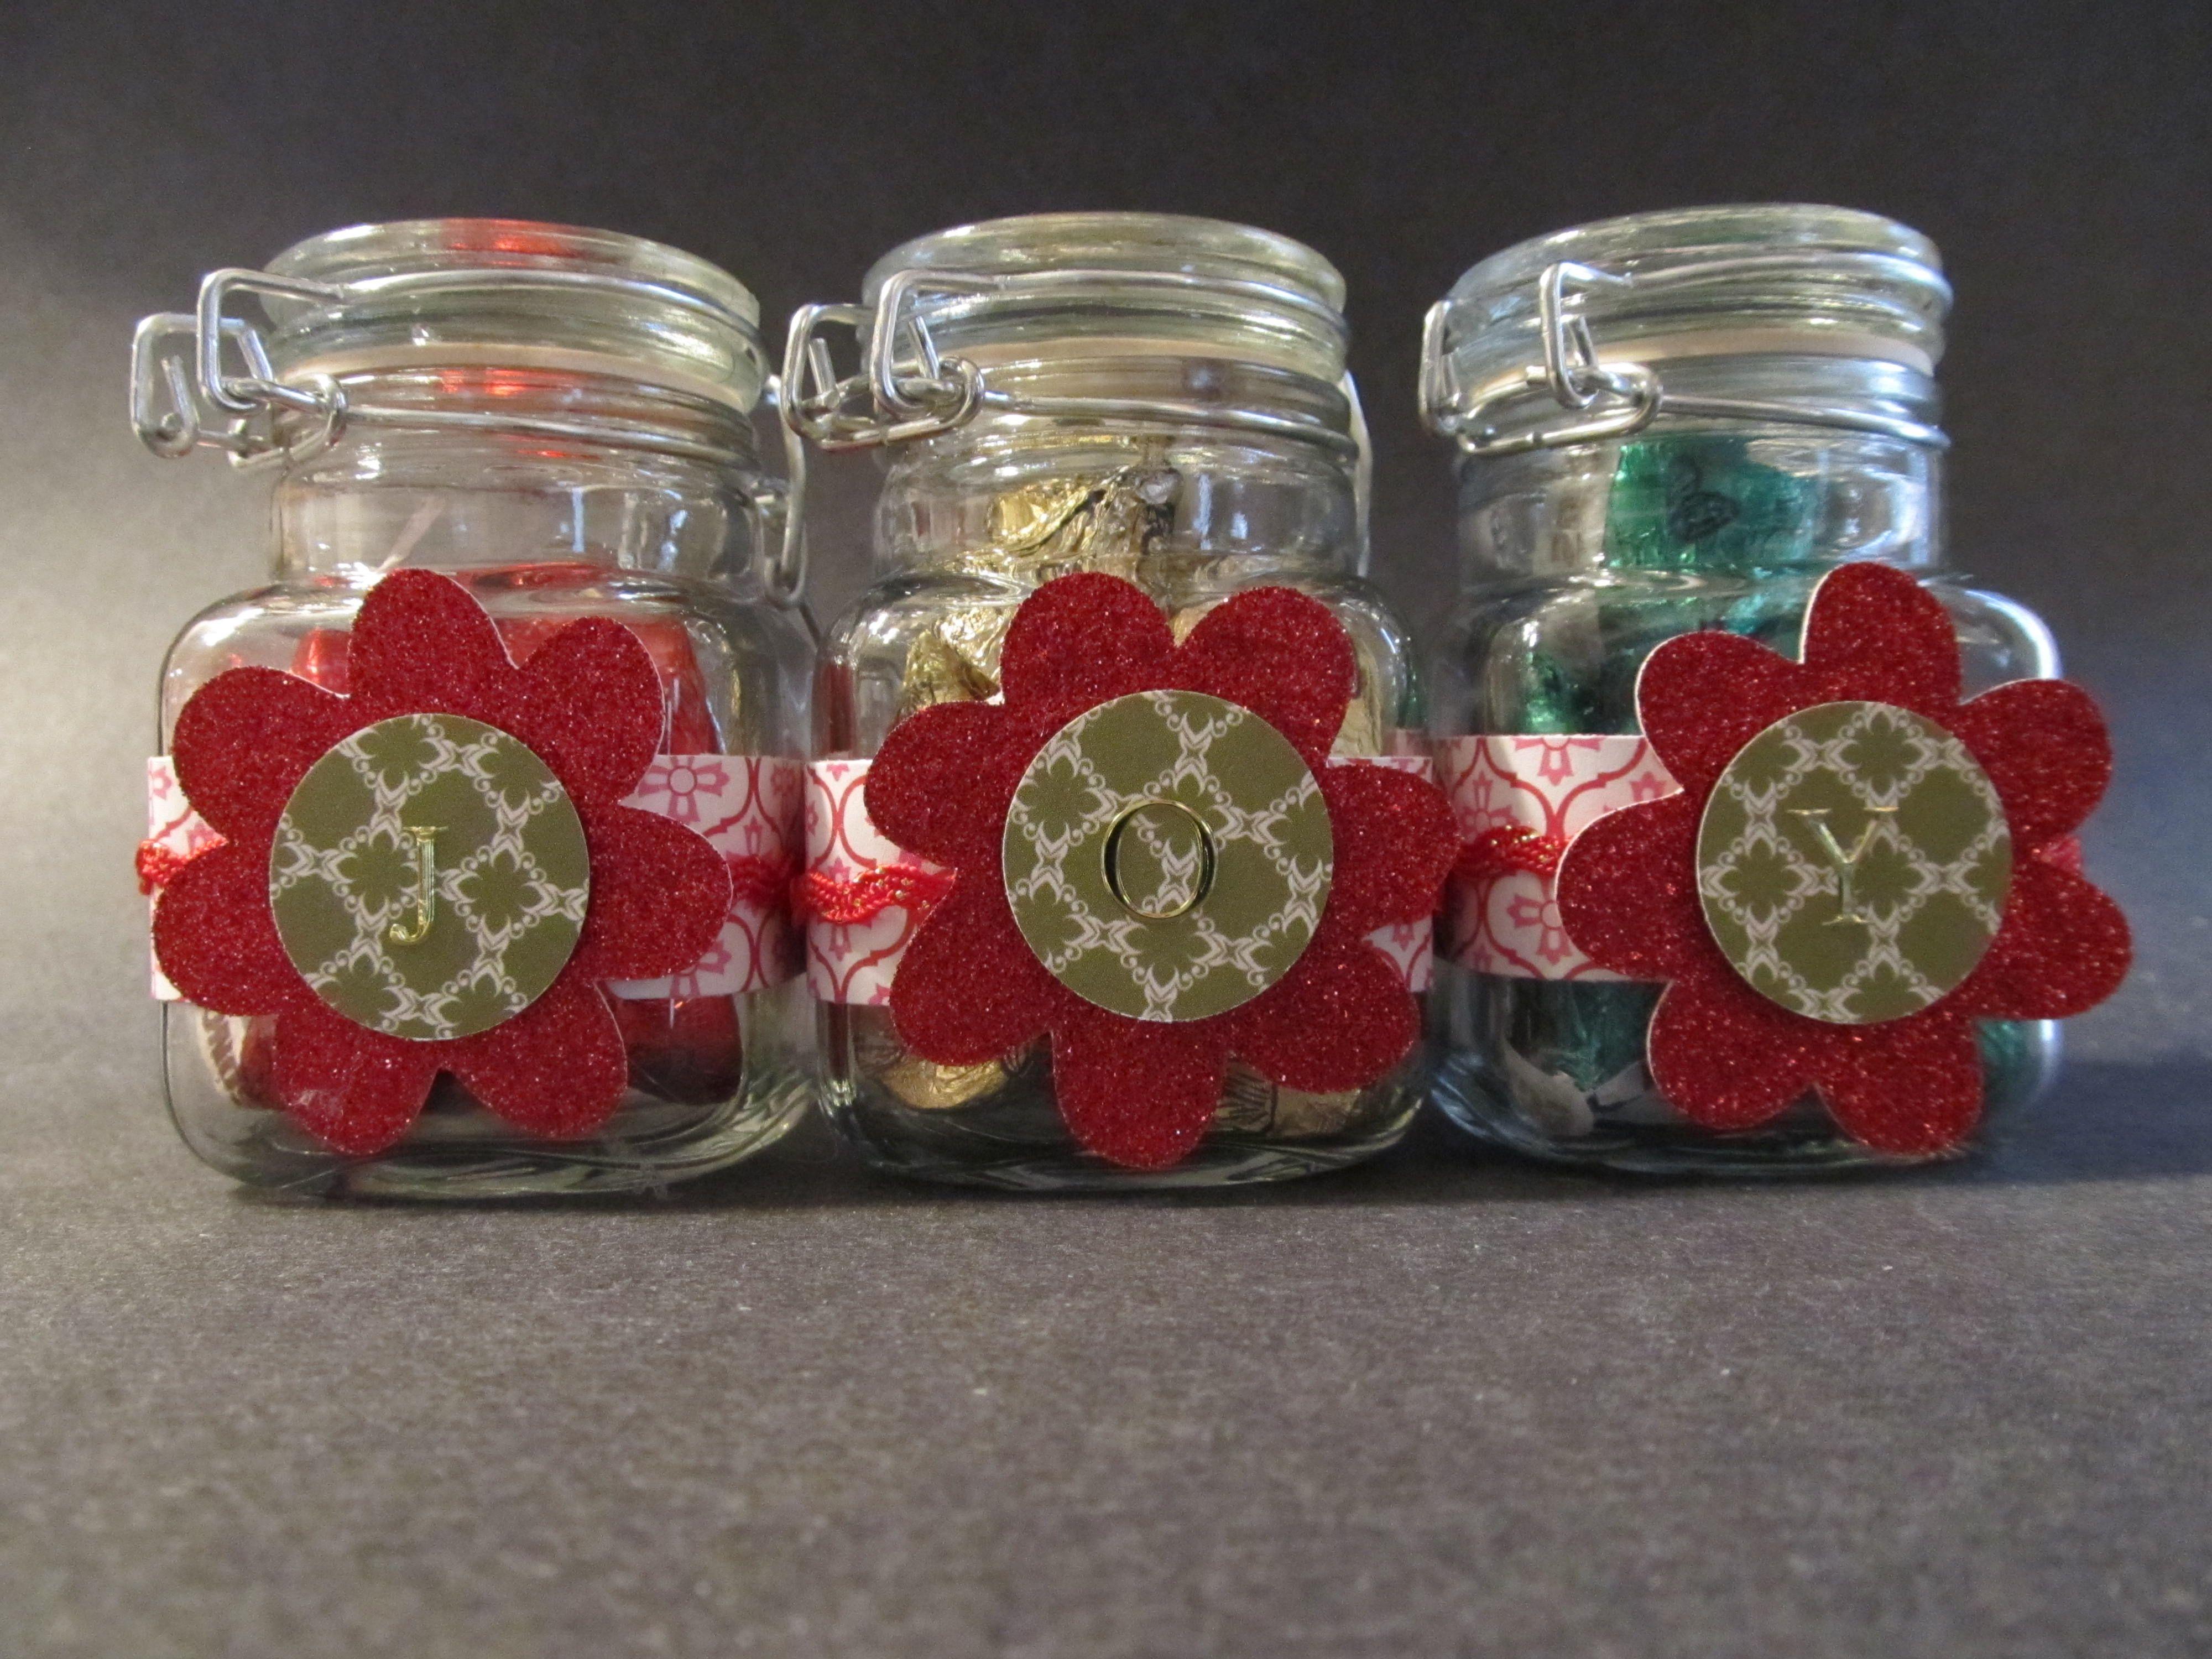 JOY Jars  Small Mason jars from Craft Warehouse Cricut cut